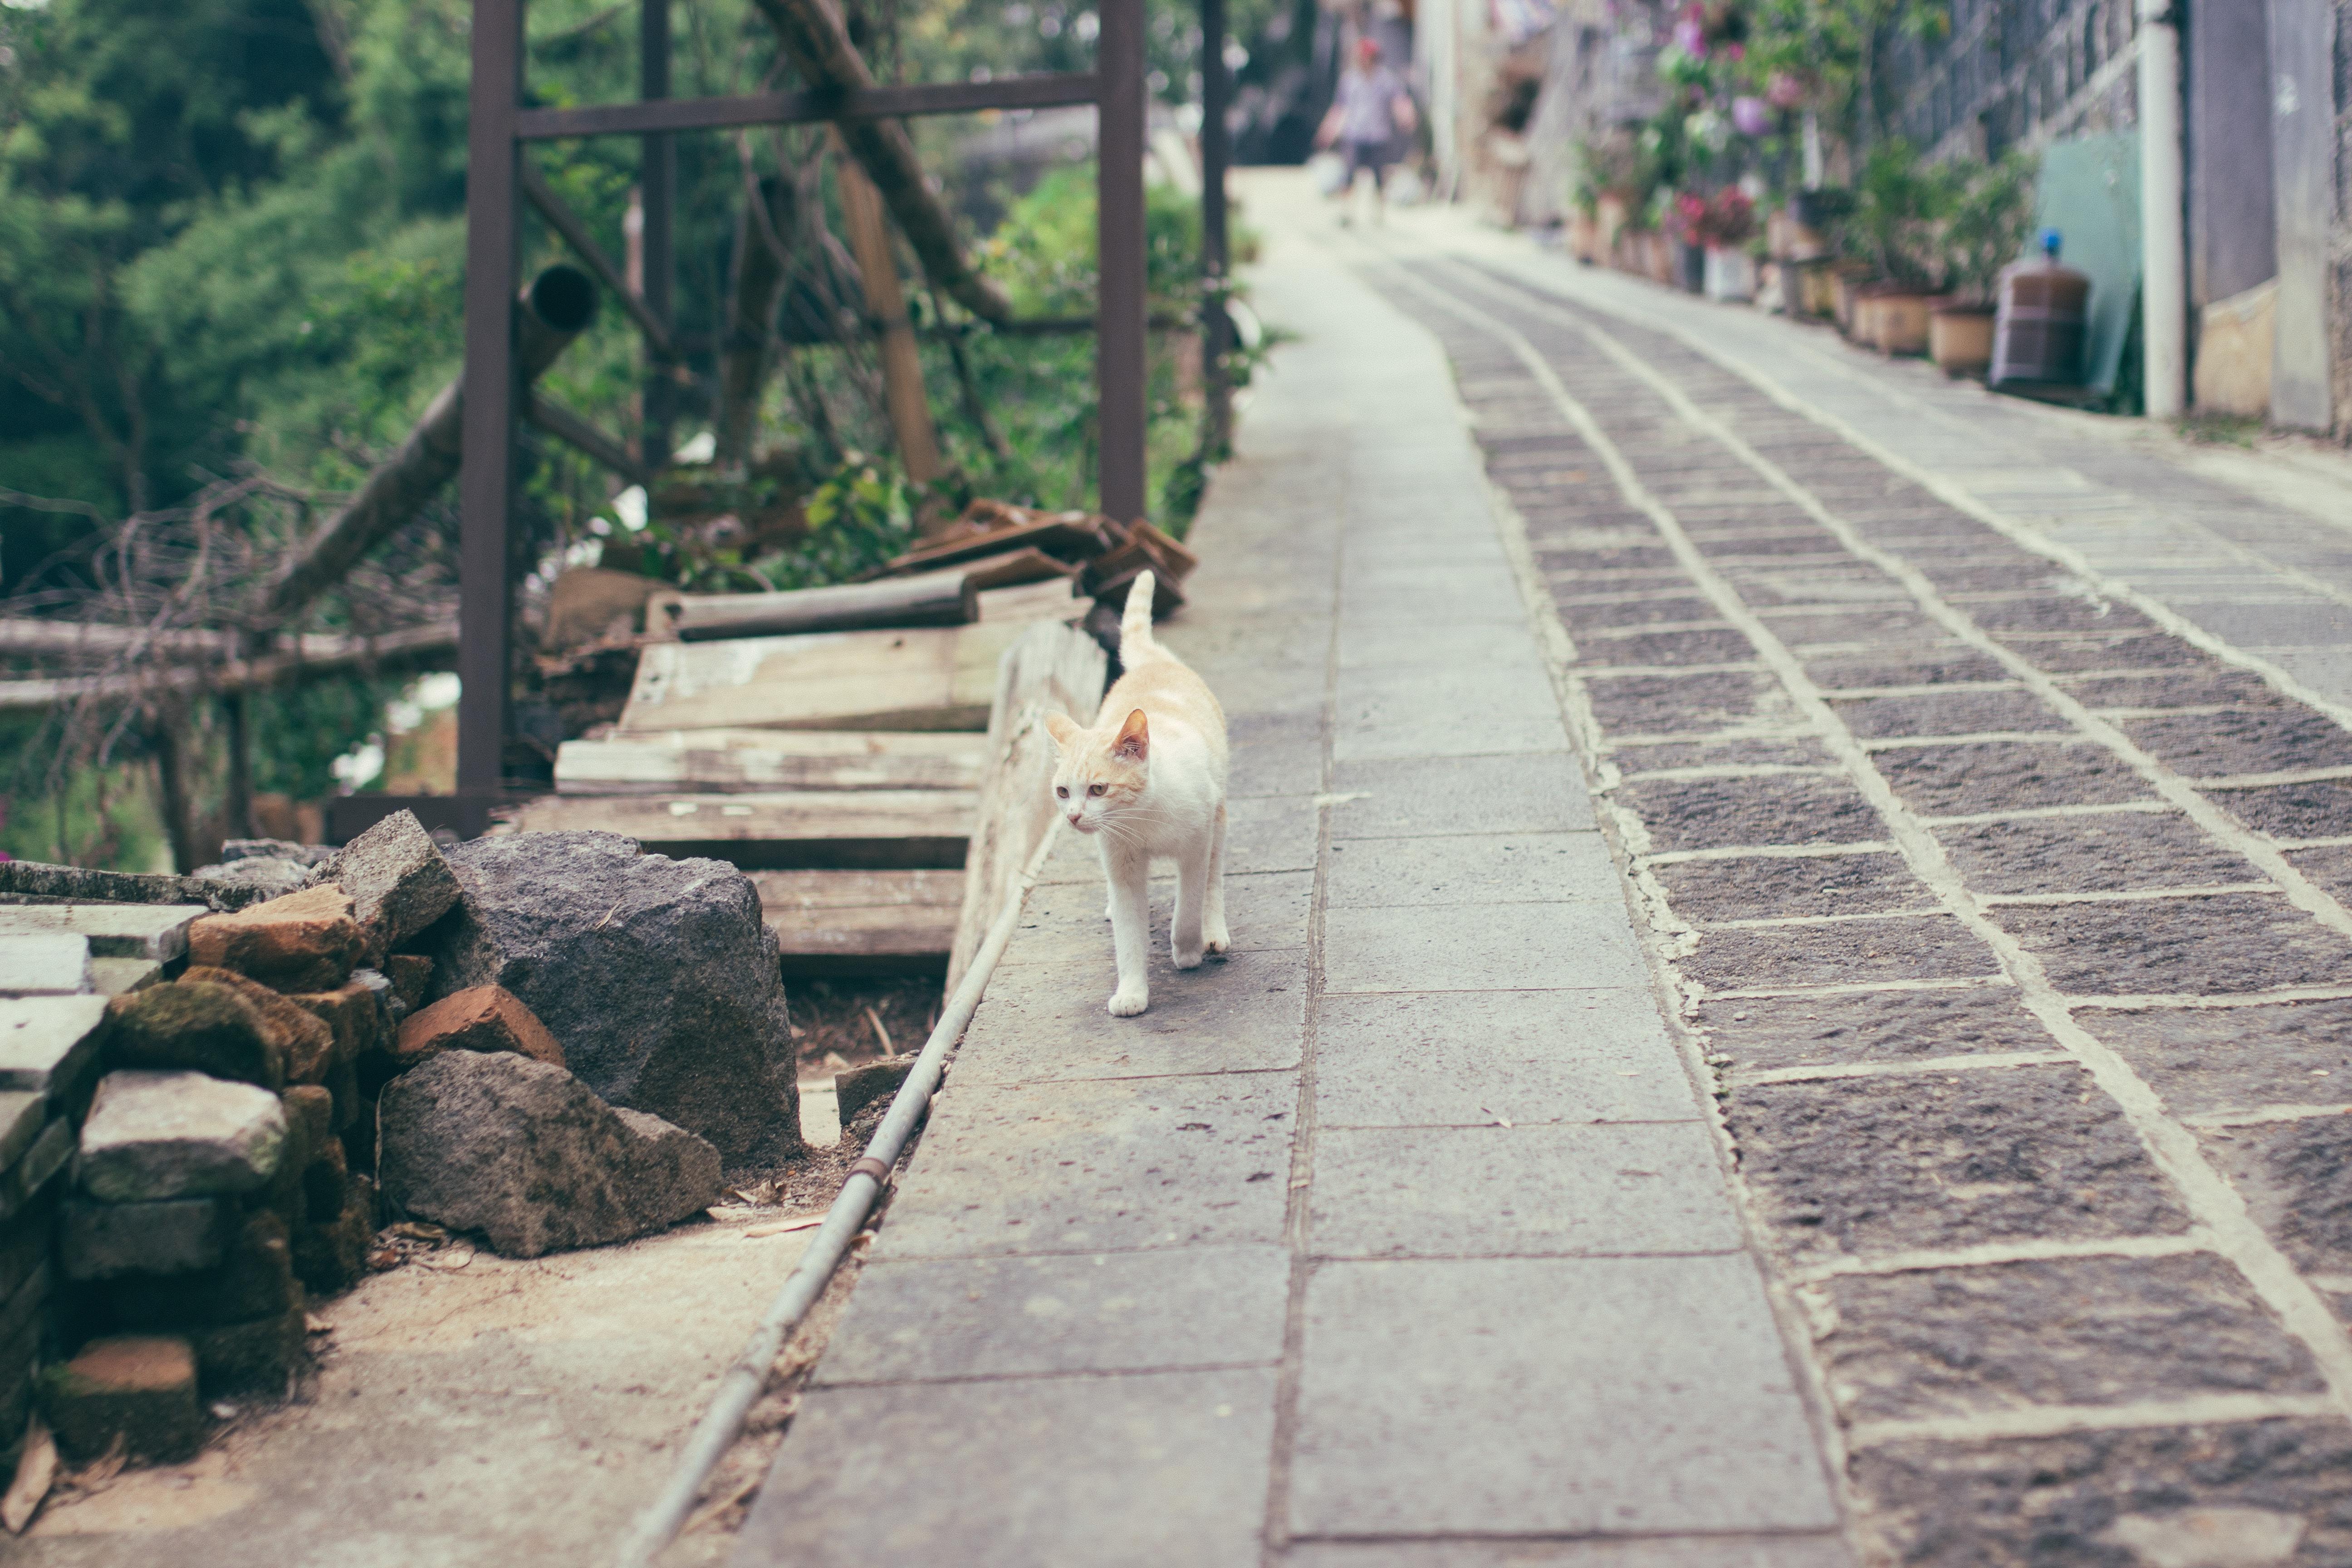 orange and white cat